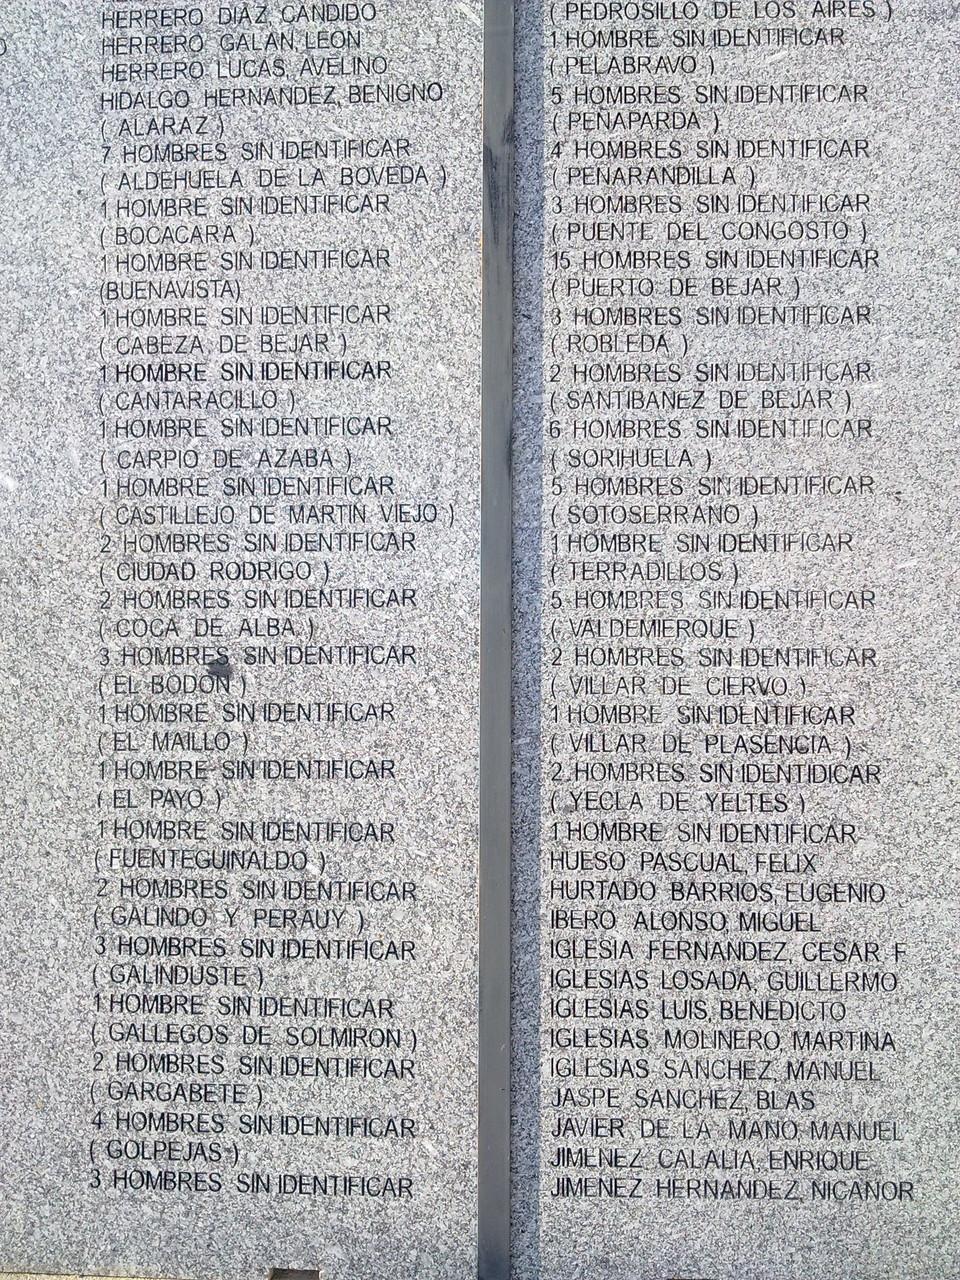 Listado de cementerio Salamanca, desconocidos, foto propia